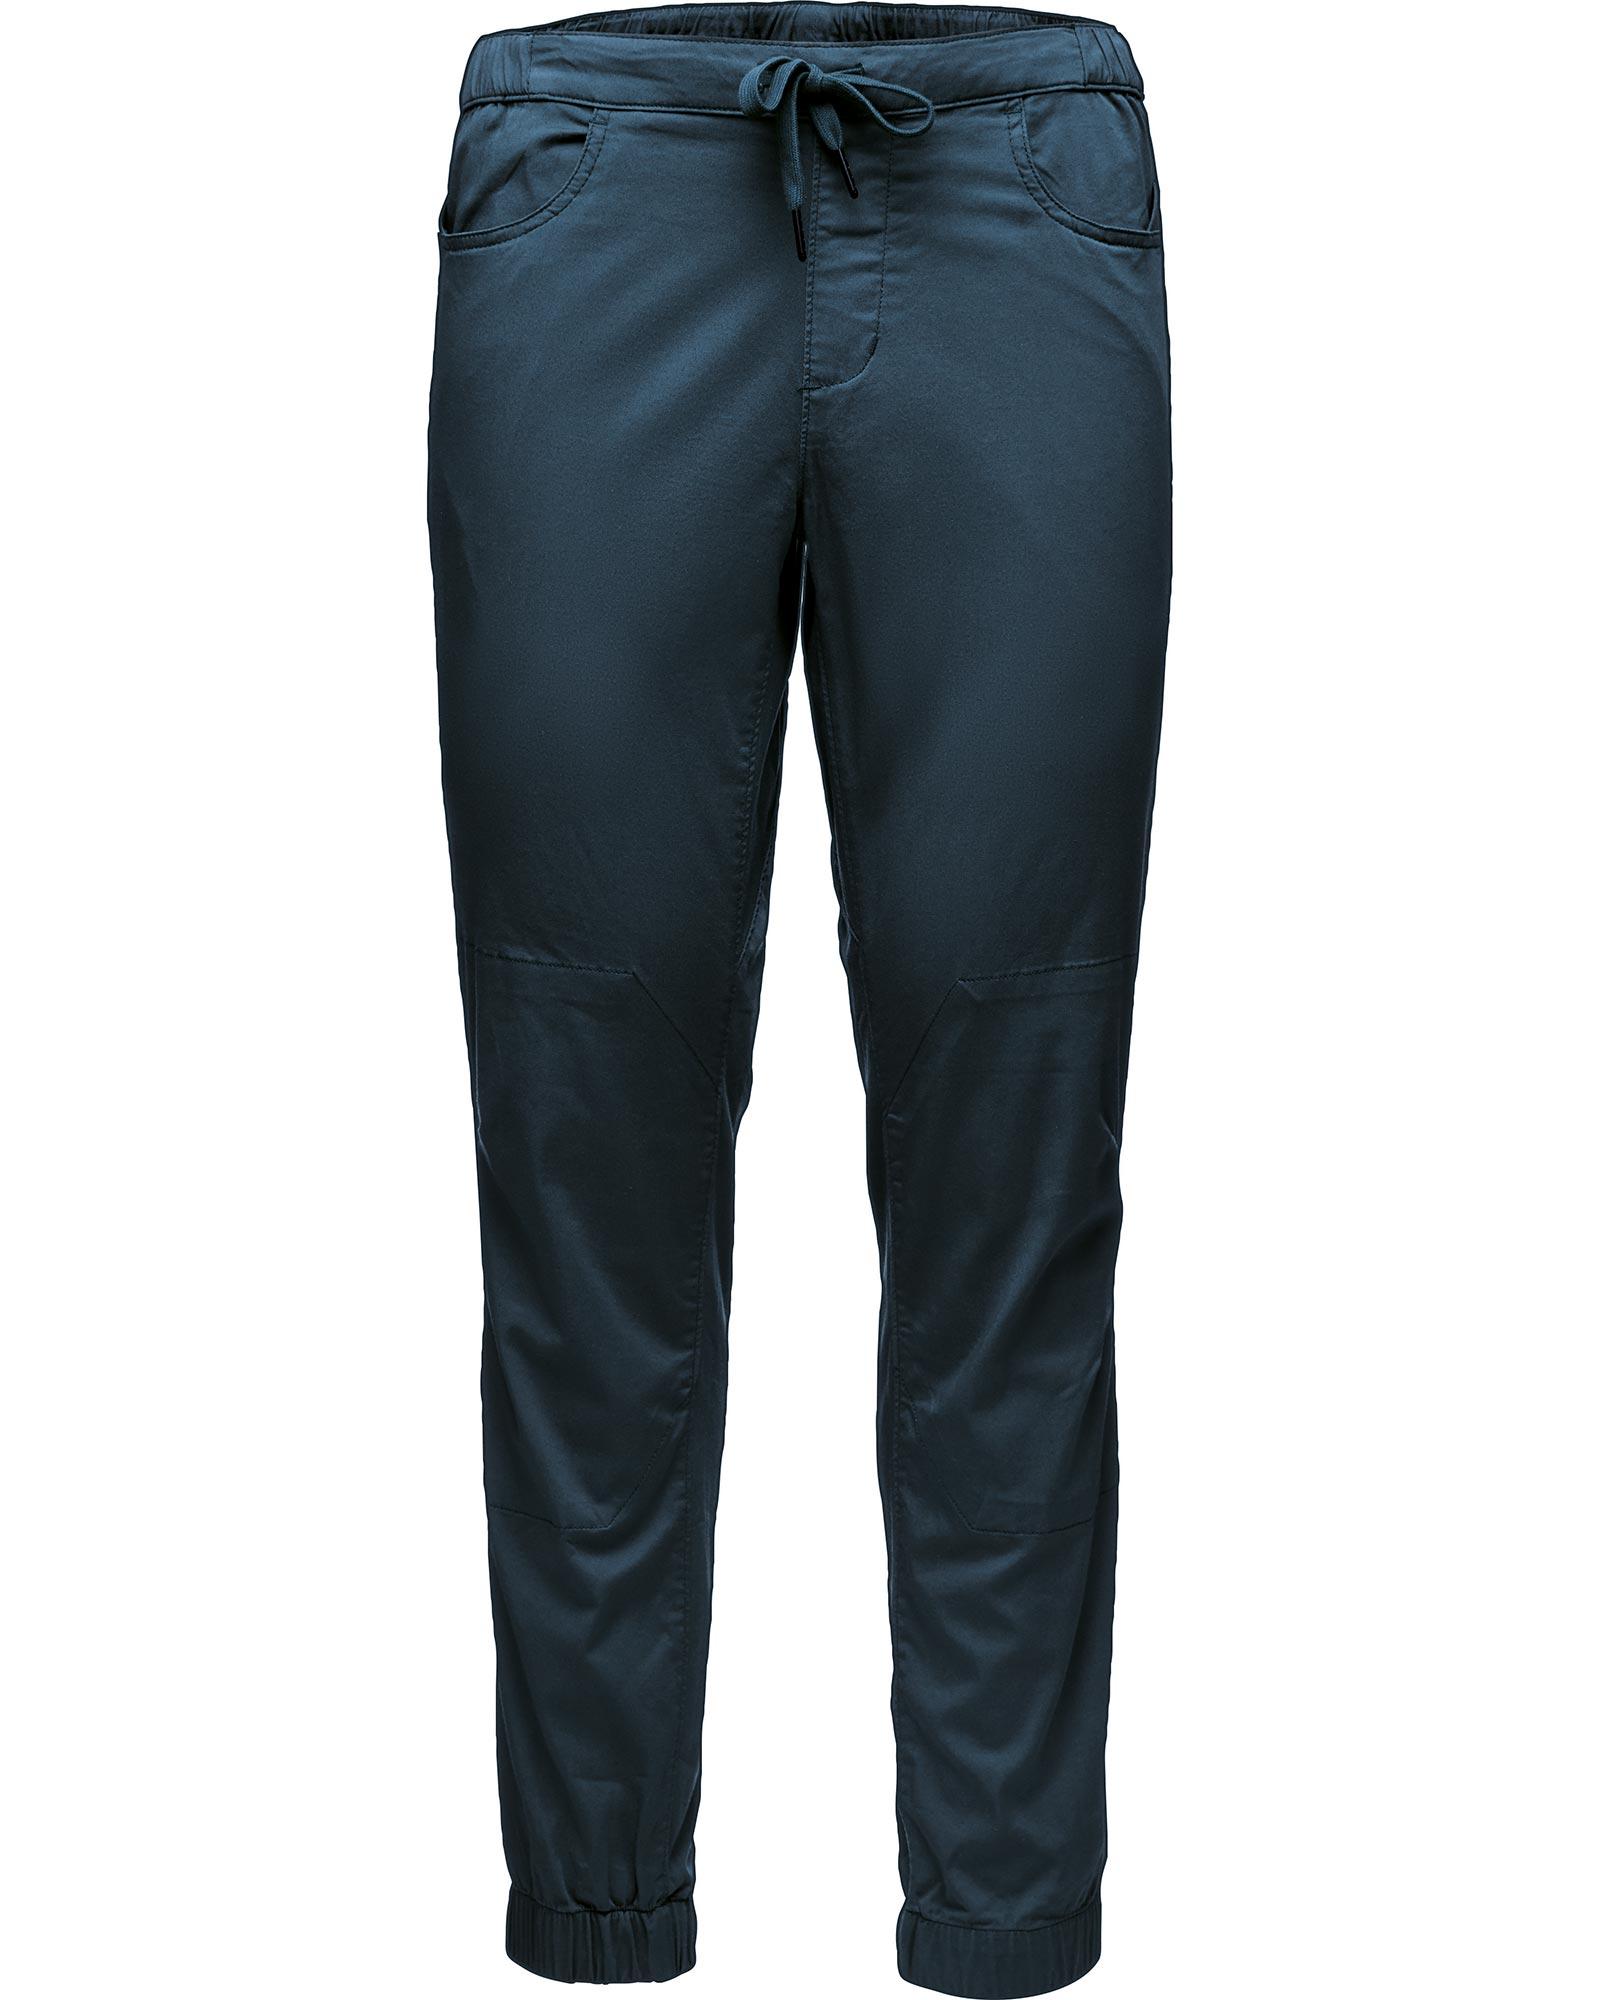 Black Diamond Men's Notion Pants 0